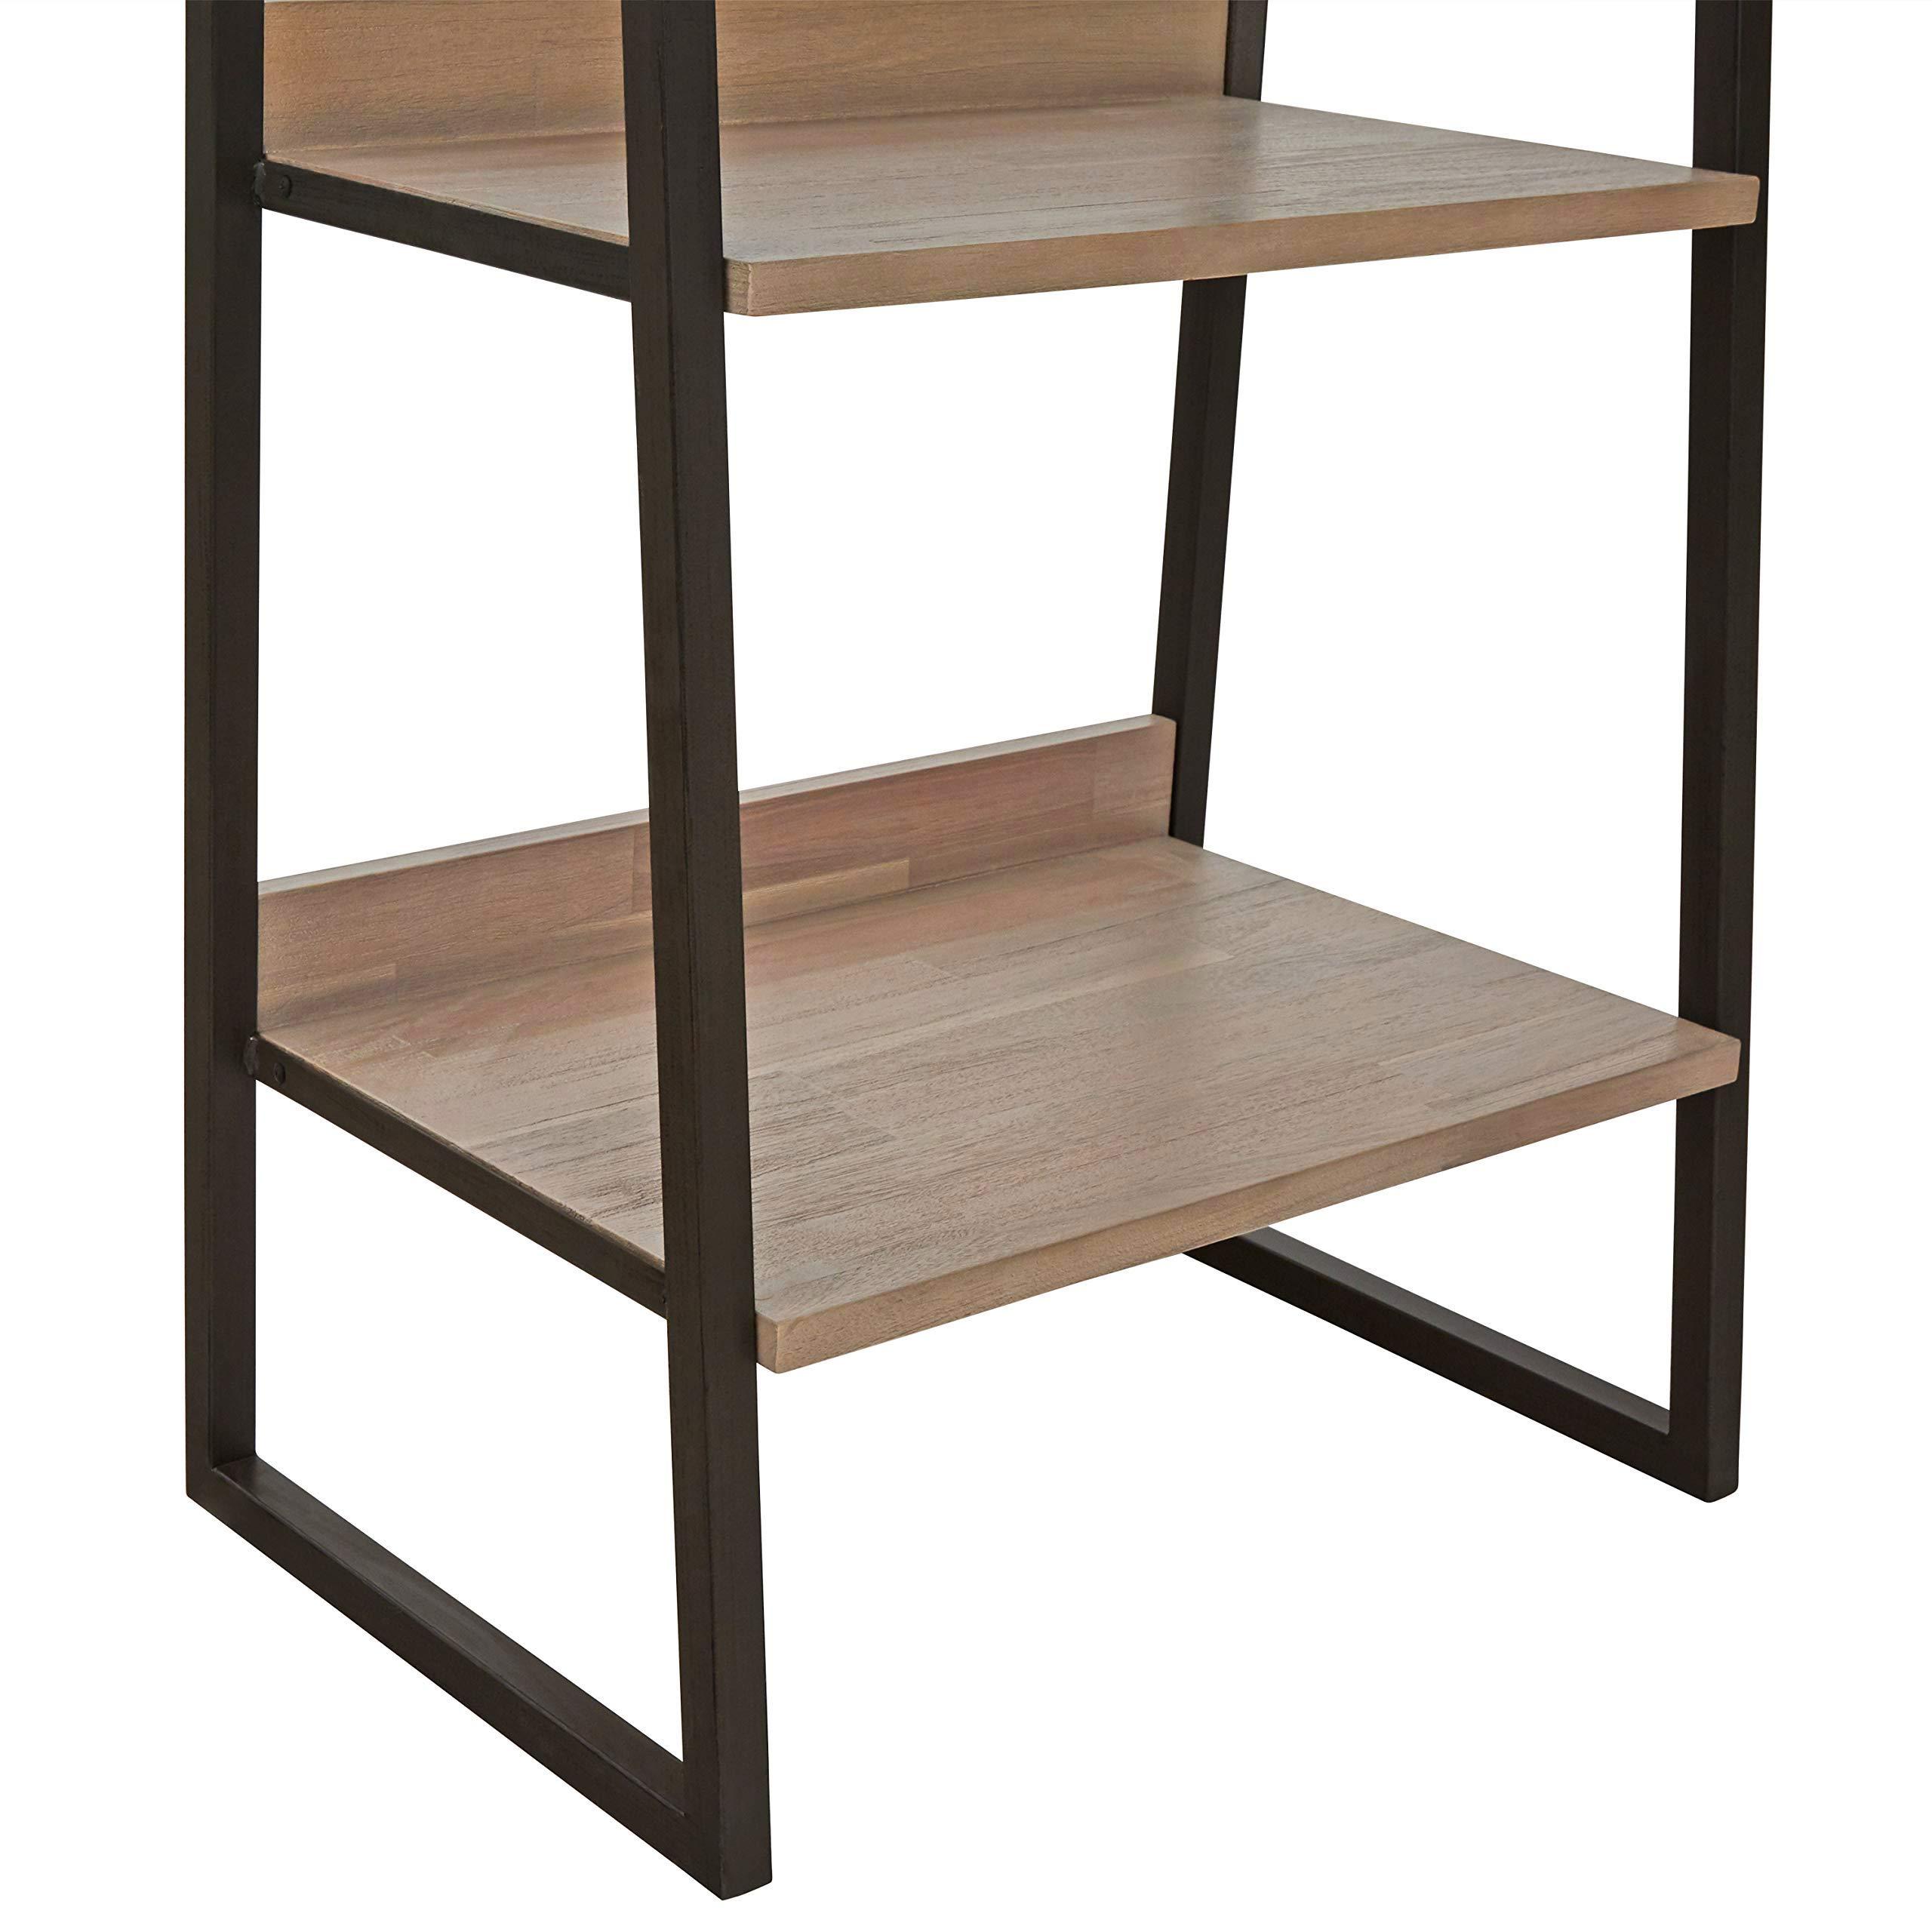 Rivet Roxmere Modern Bookcase, 23.6''W, Acacia, Sandblast Gray by Rivet (Image #6)